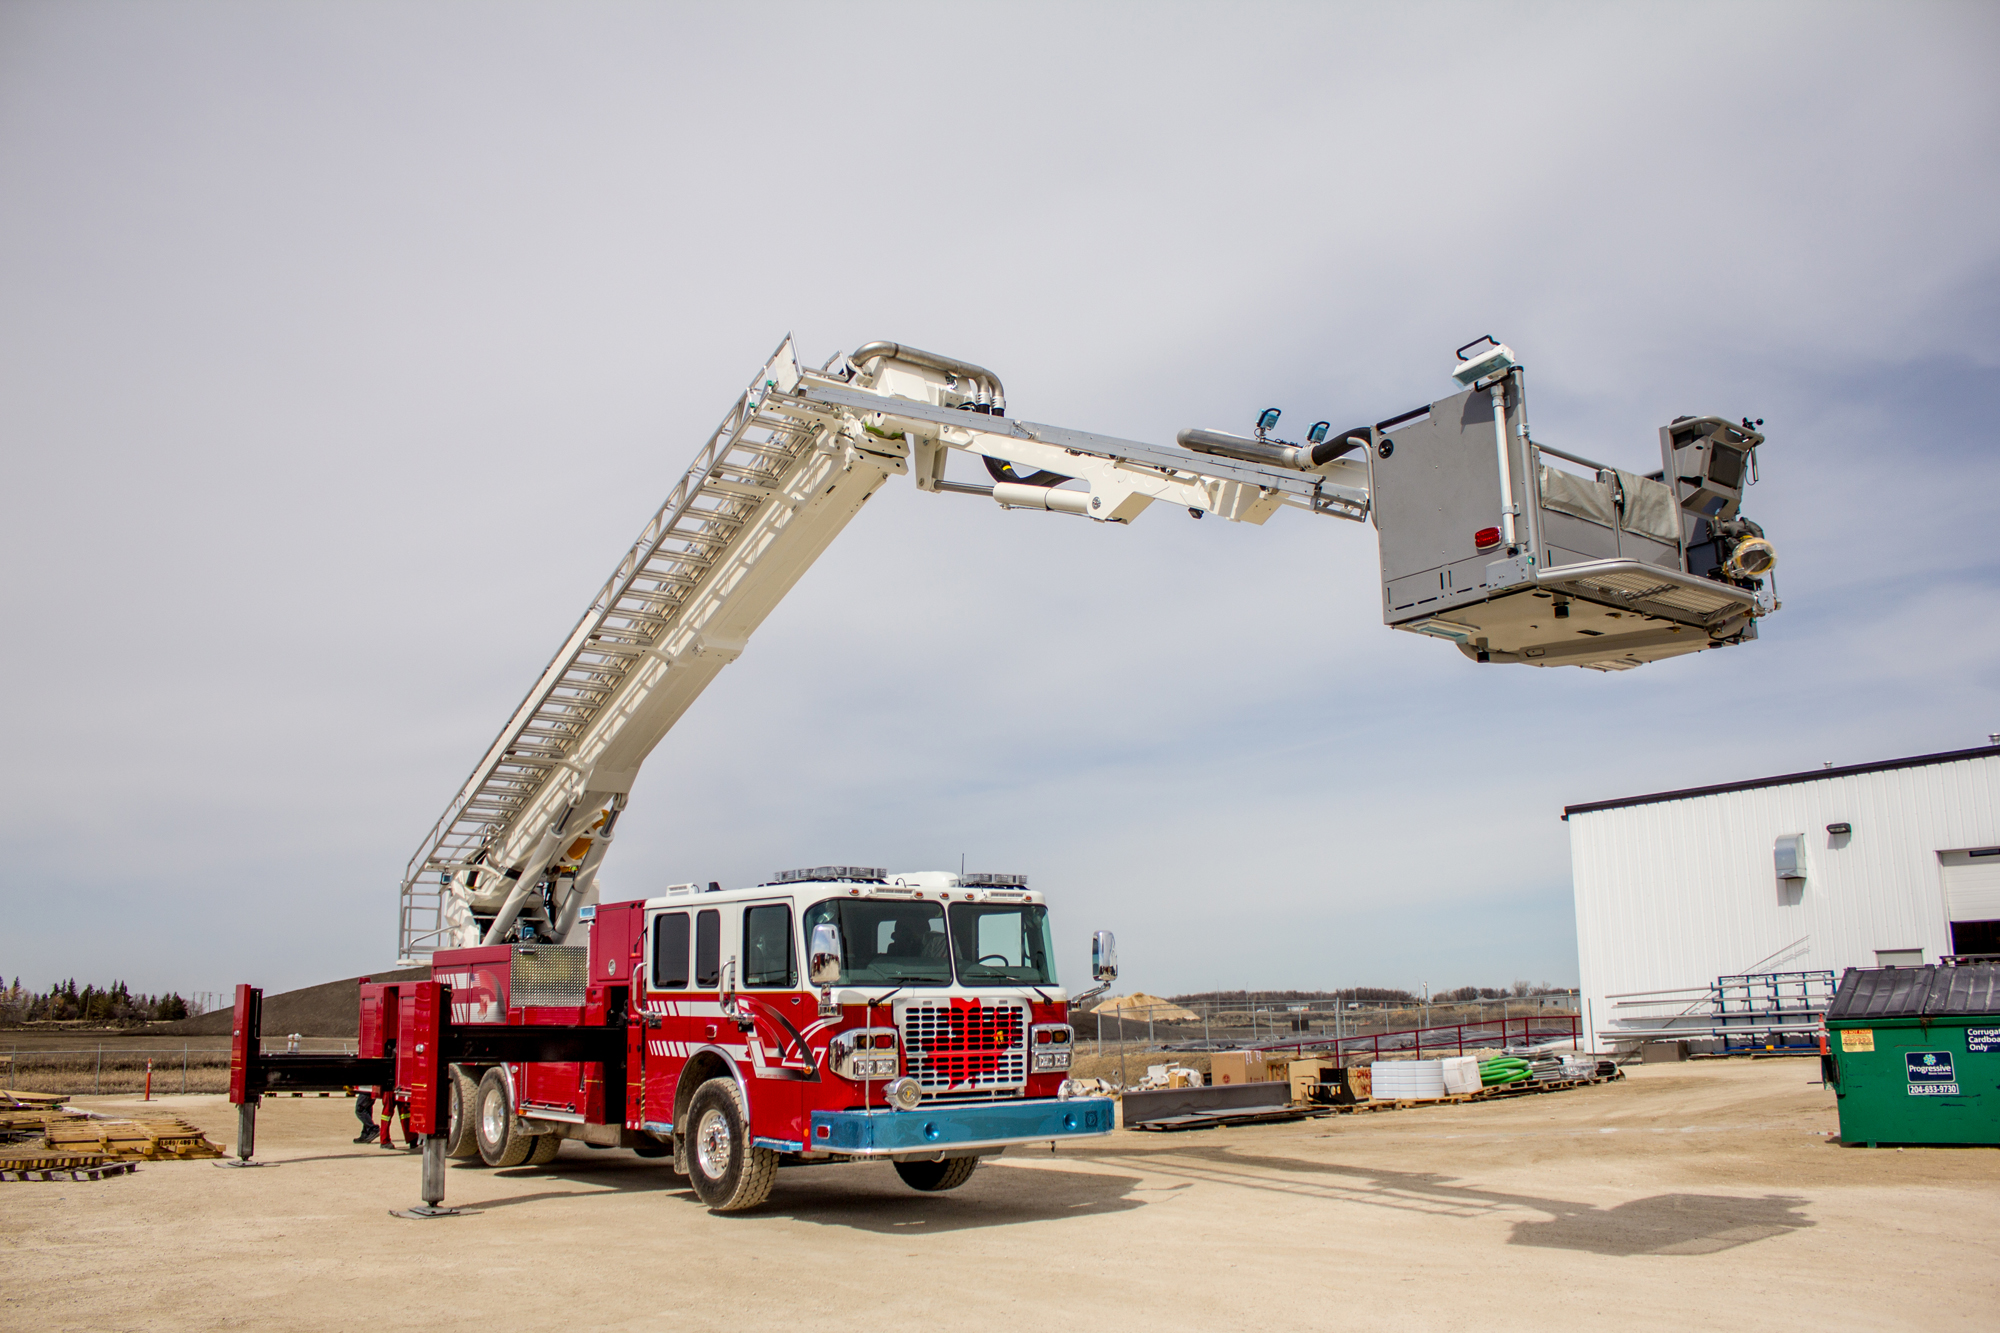 Bronto Skylift F 116rlp Demo Unit Testing Fort Garry